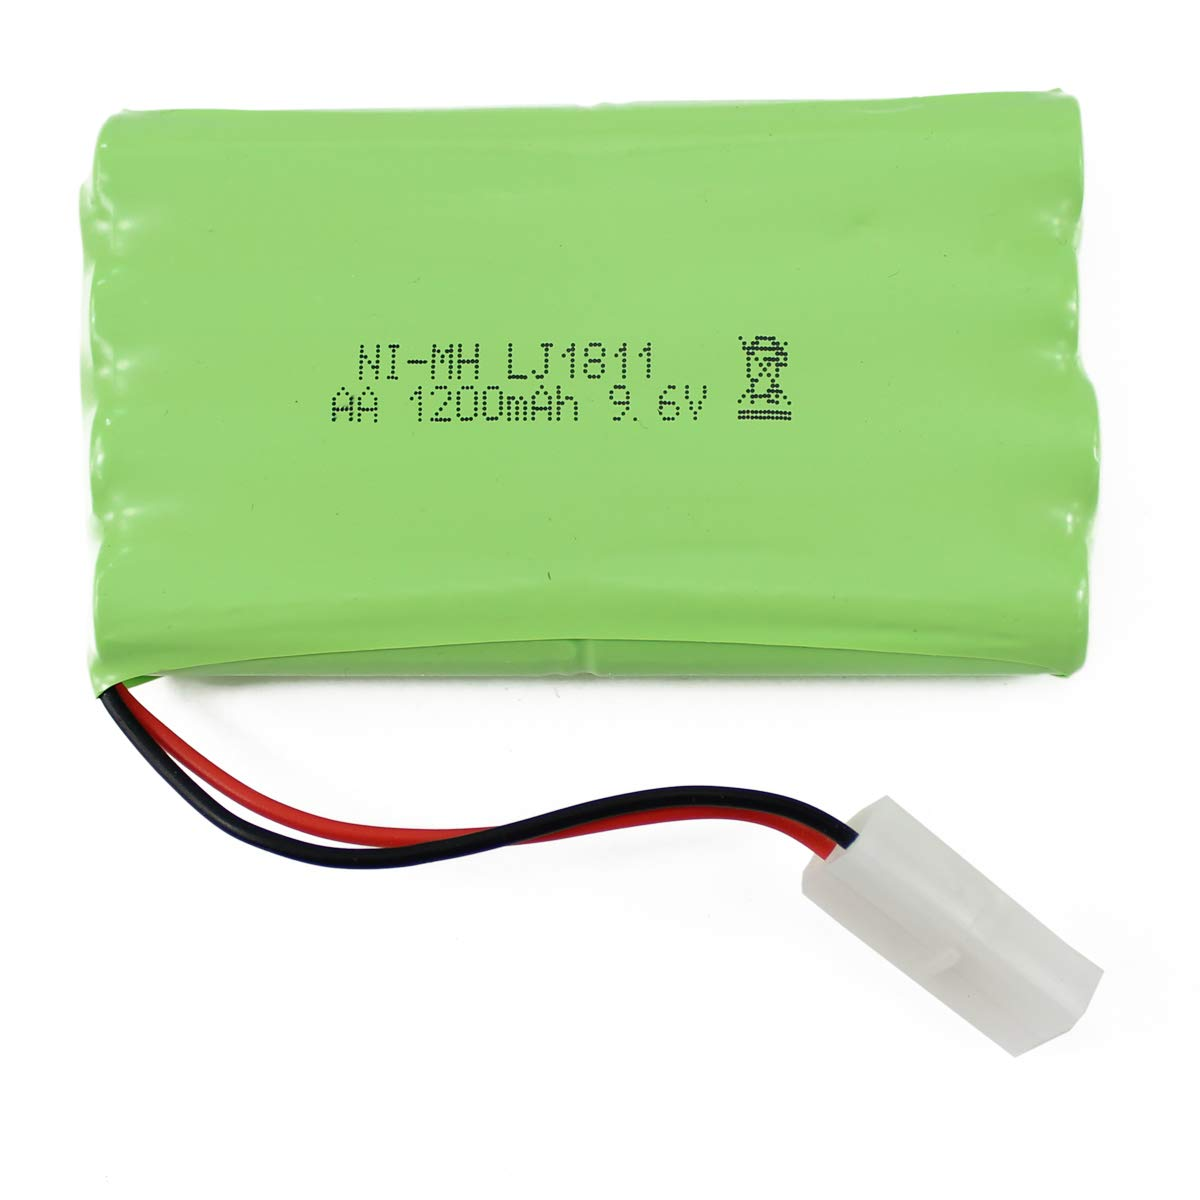 Bateria LIPO 9.6V 1200mah RC FISCA